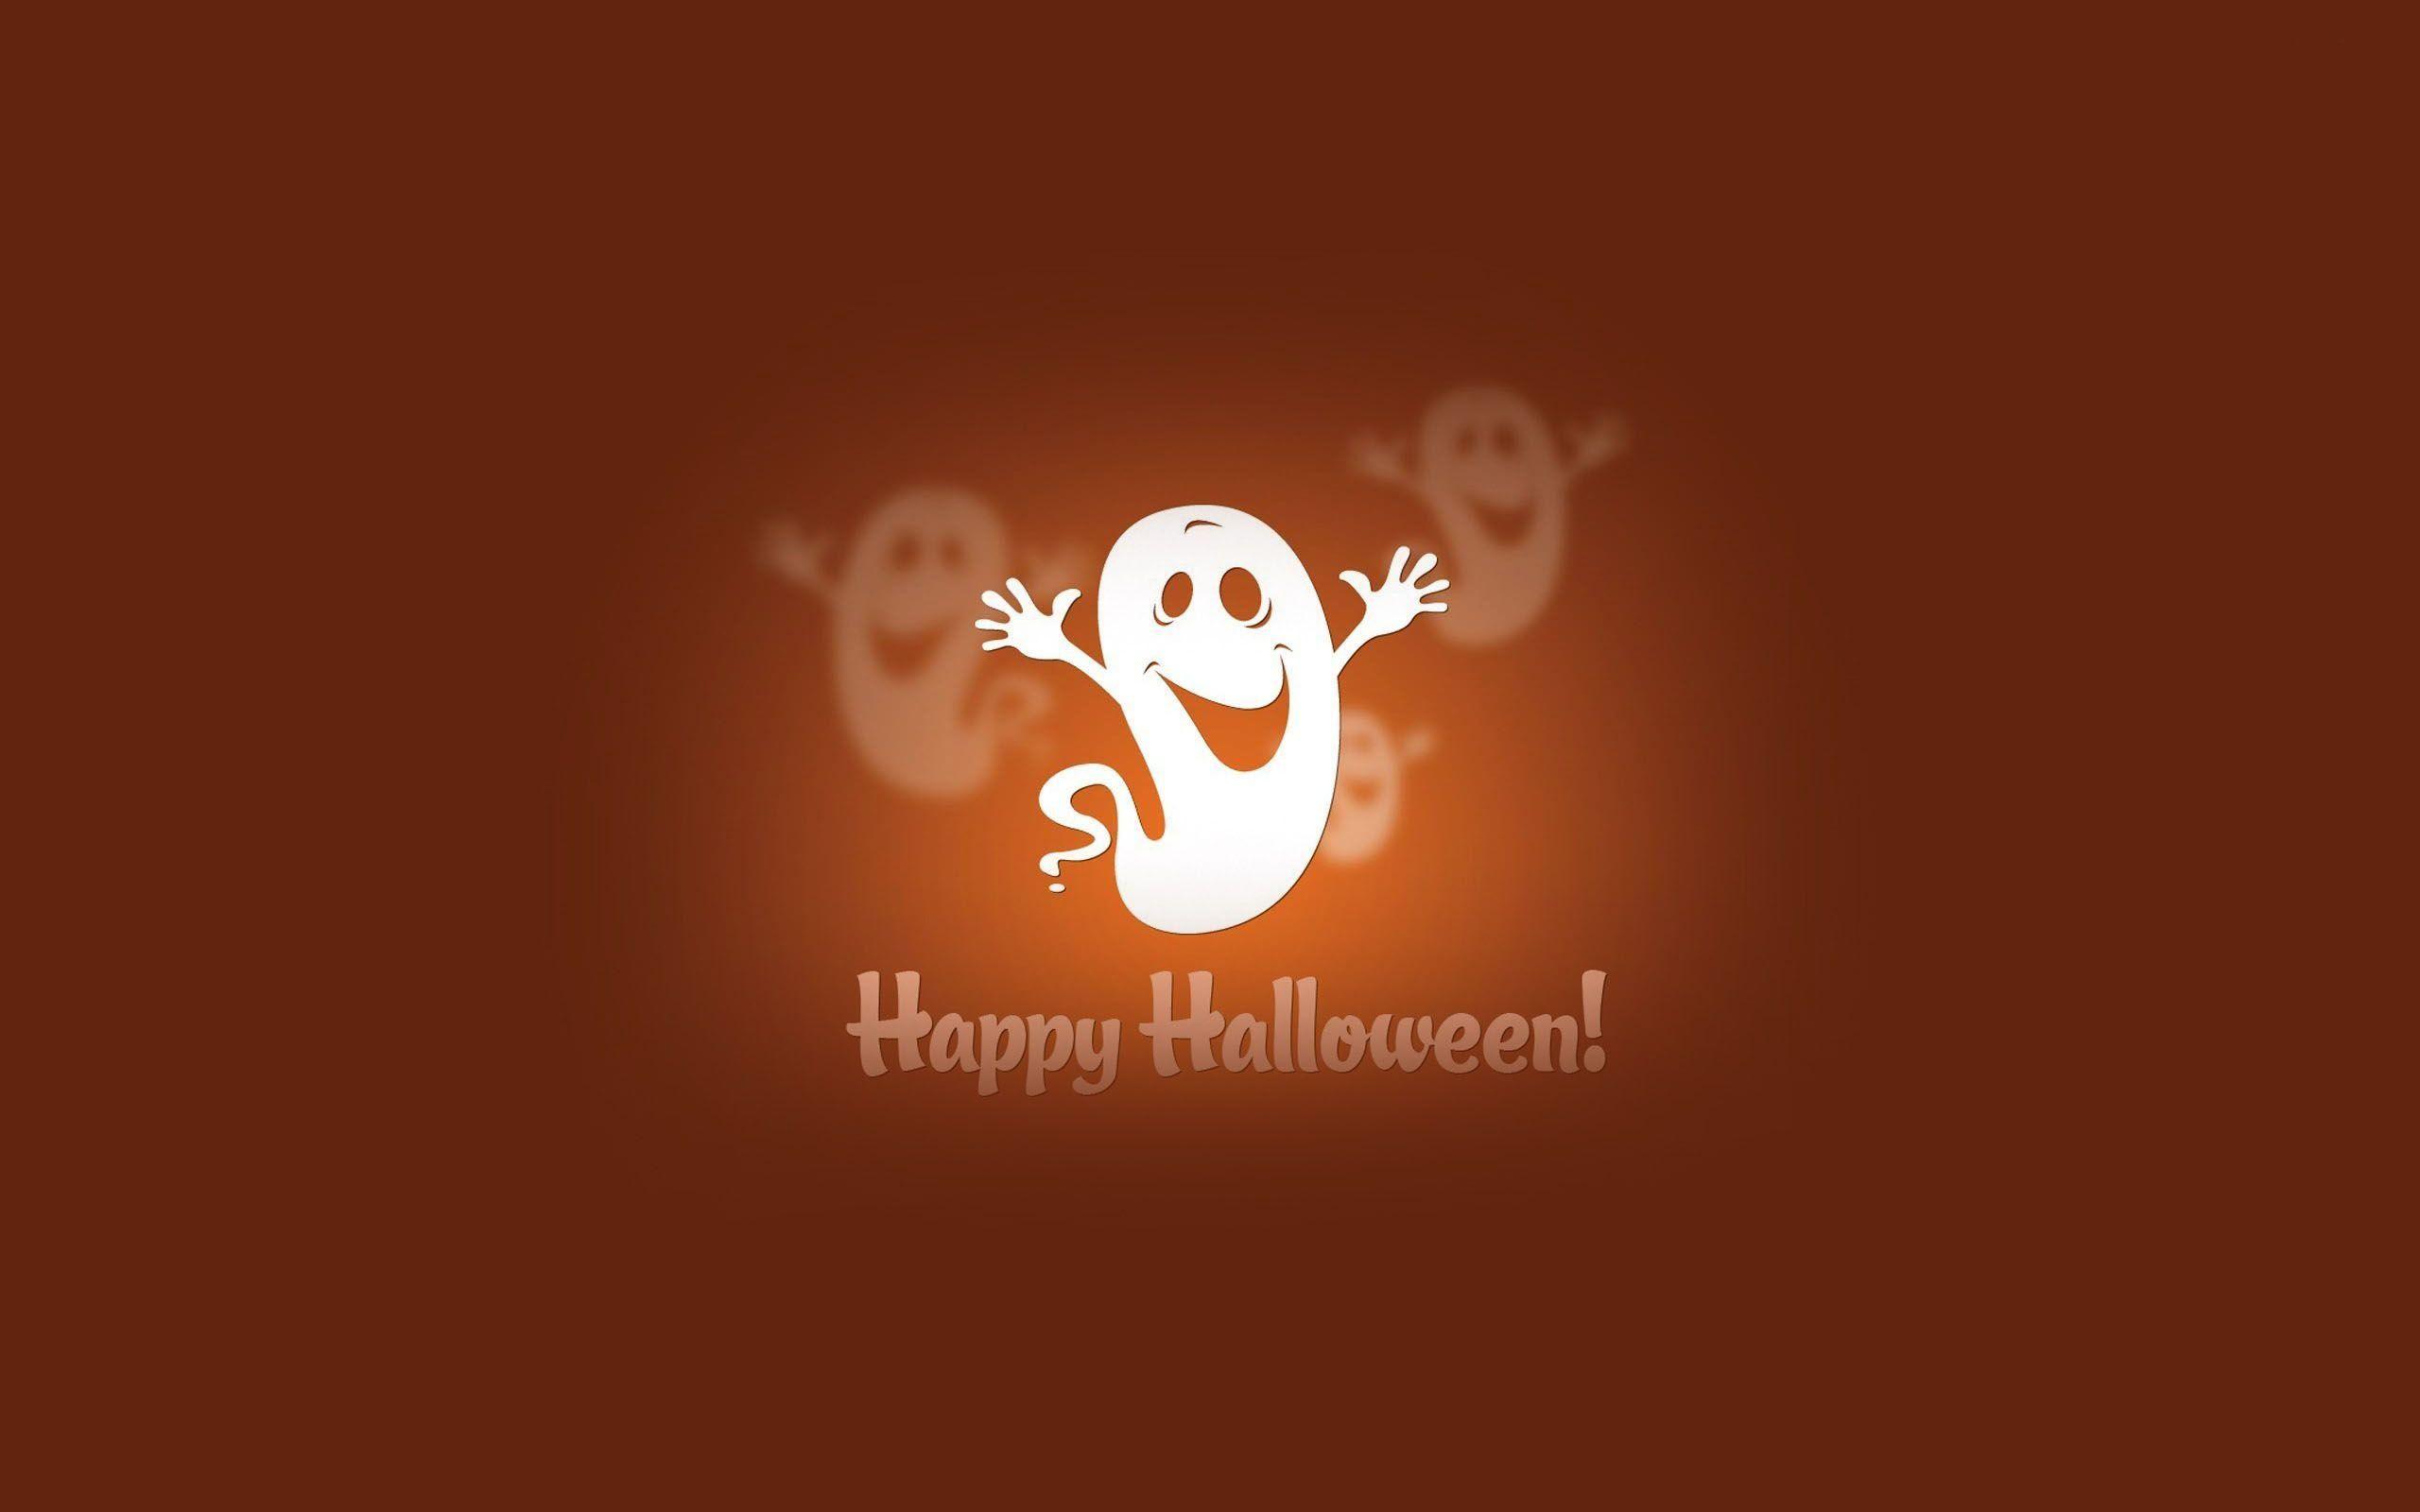 free download funny halloween hd wallpaper for your desktop 2